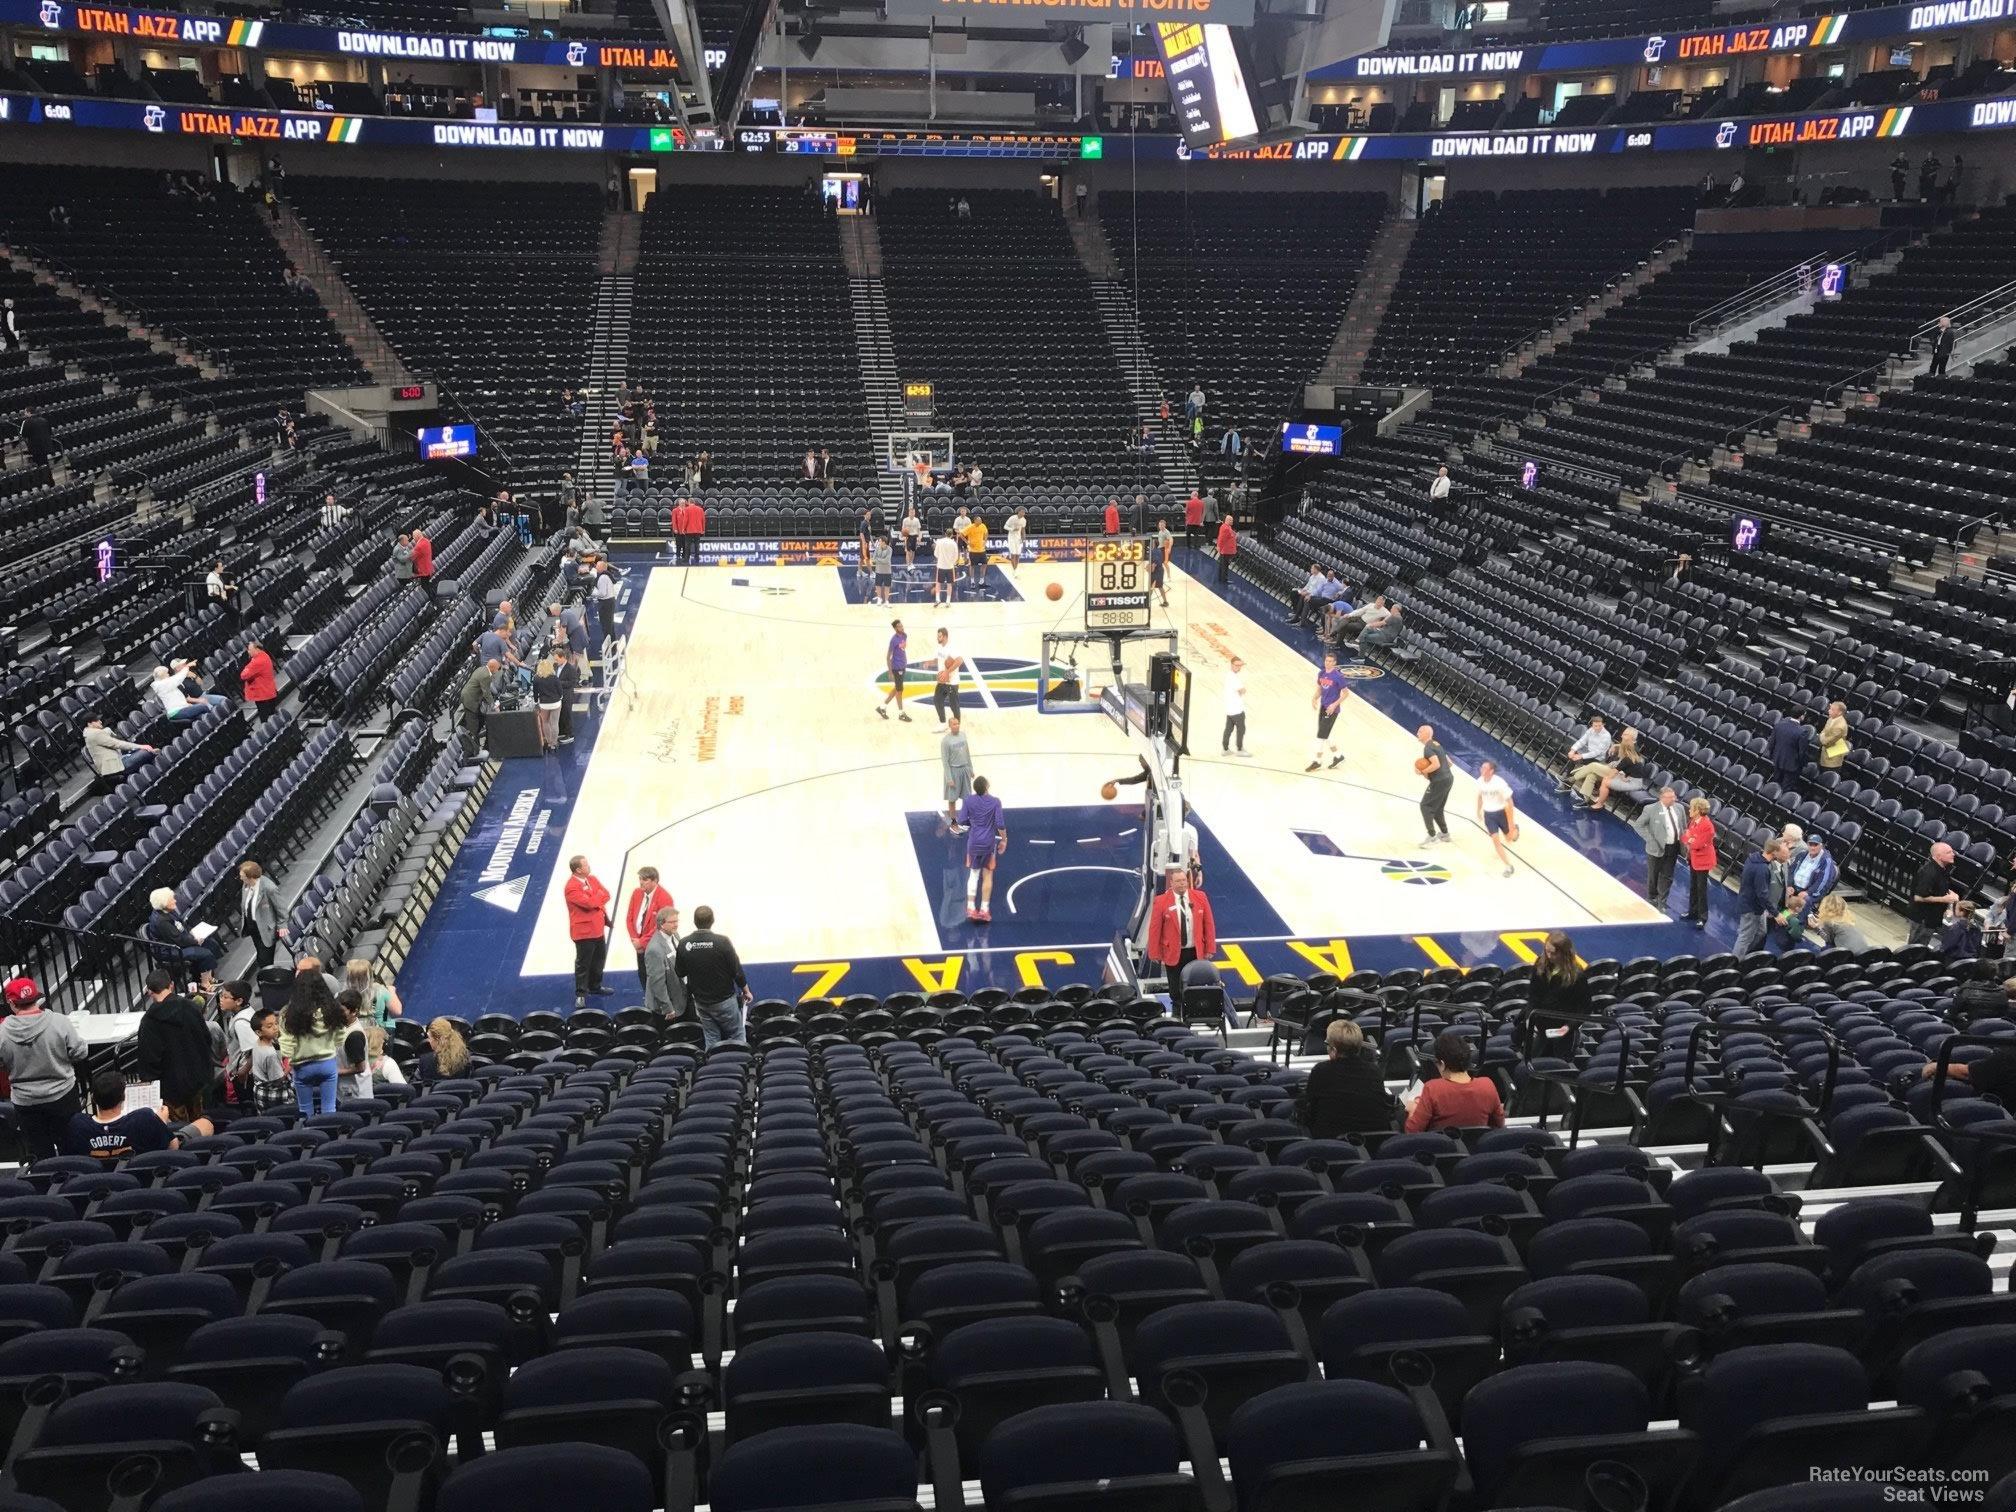 Section 2 At Vivint Arena Utah Jazz Rateyourseats Com